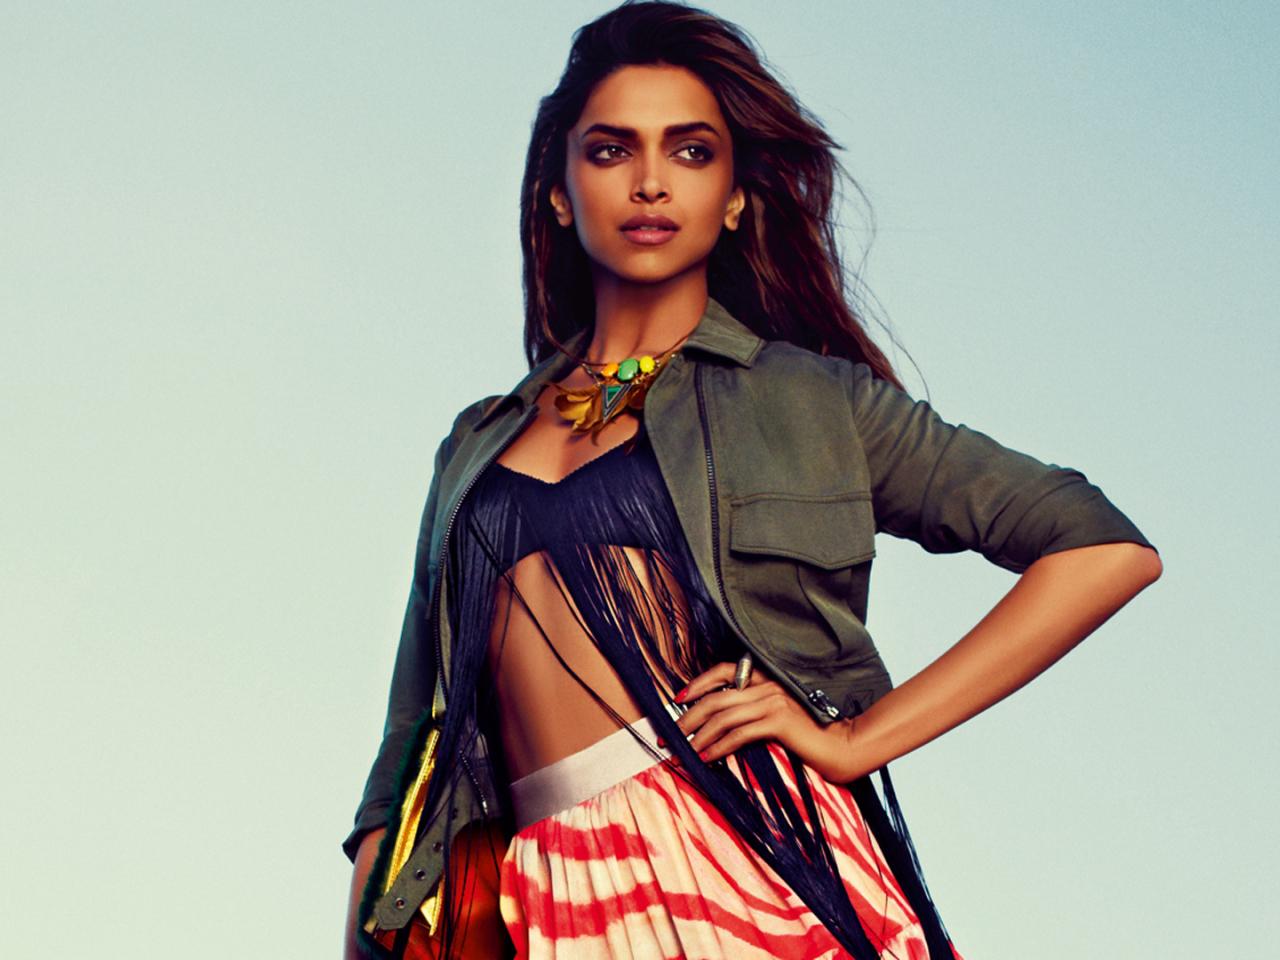 Deepika From Padmavat Hd Wallpaper: Deepika Padukone Bollywood Heroine, Full HD Wallpaper